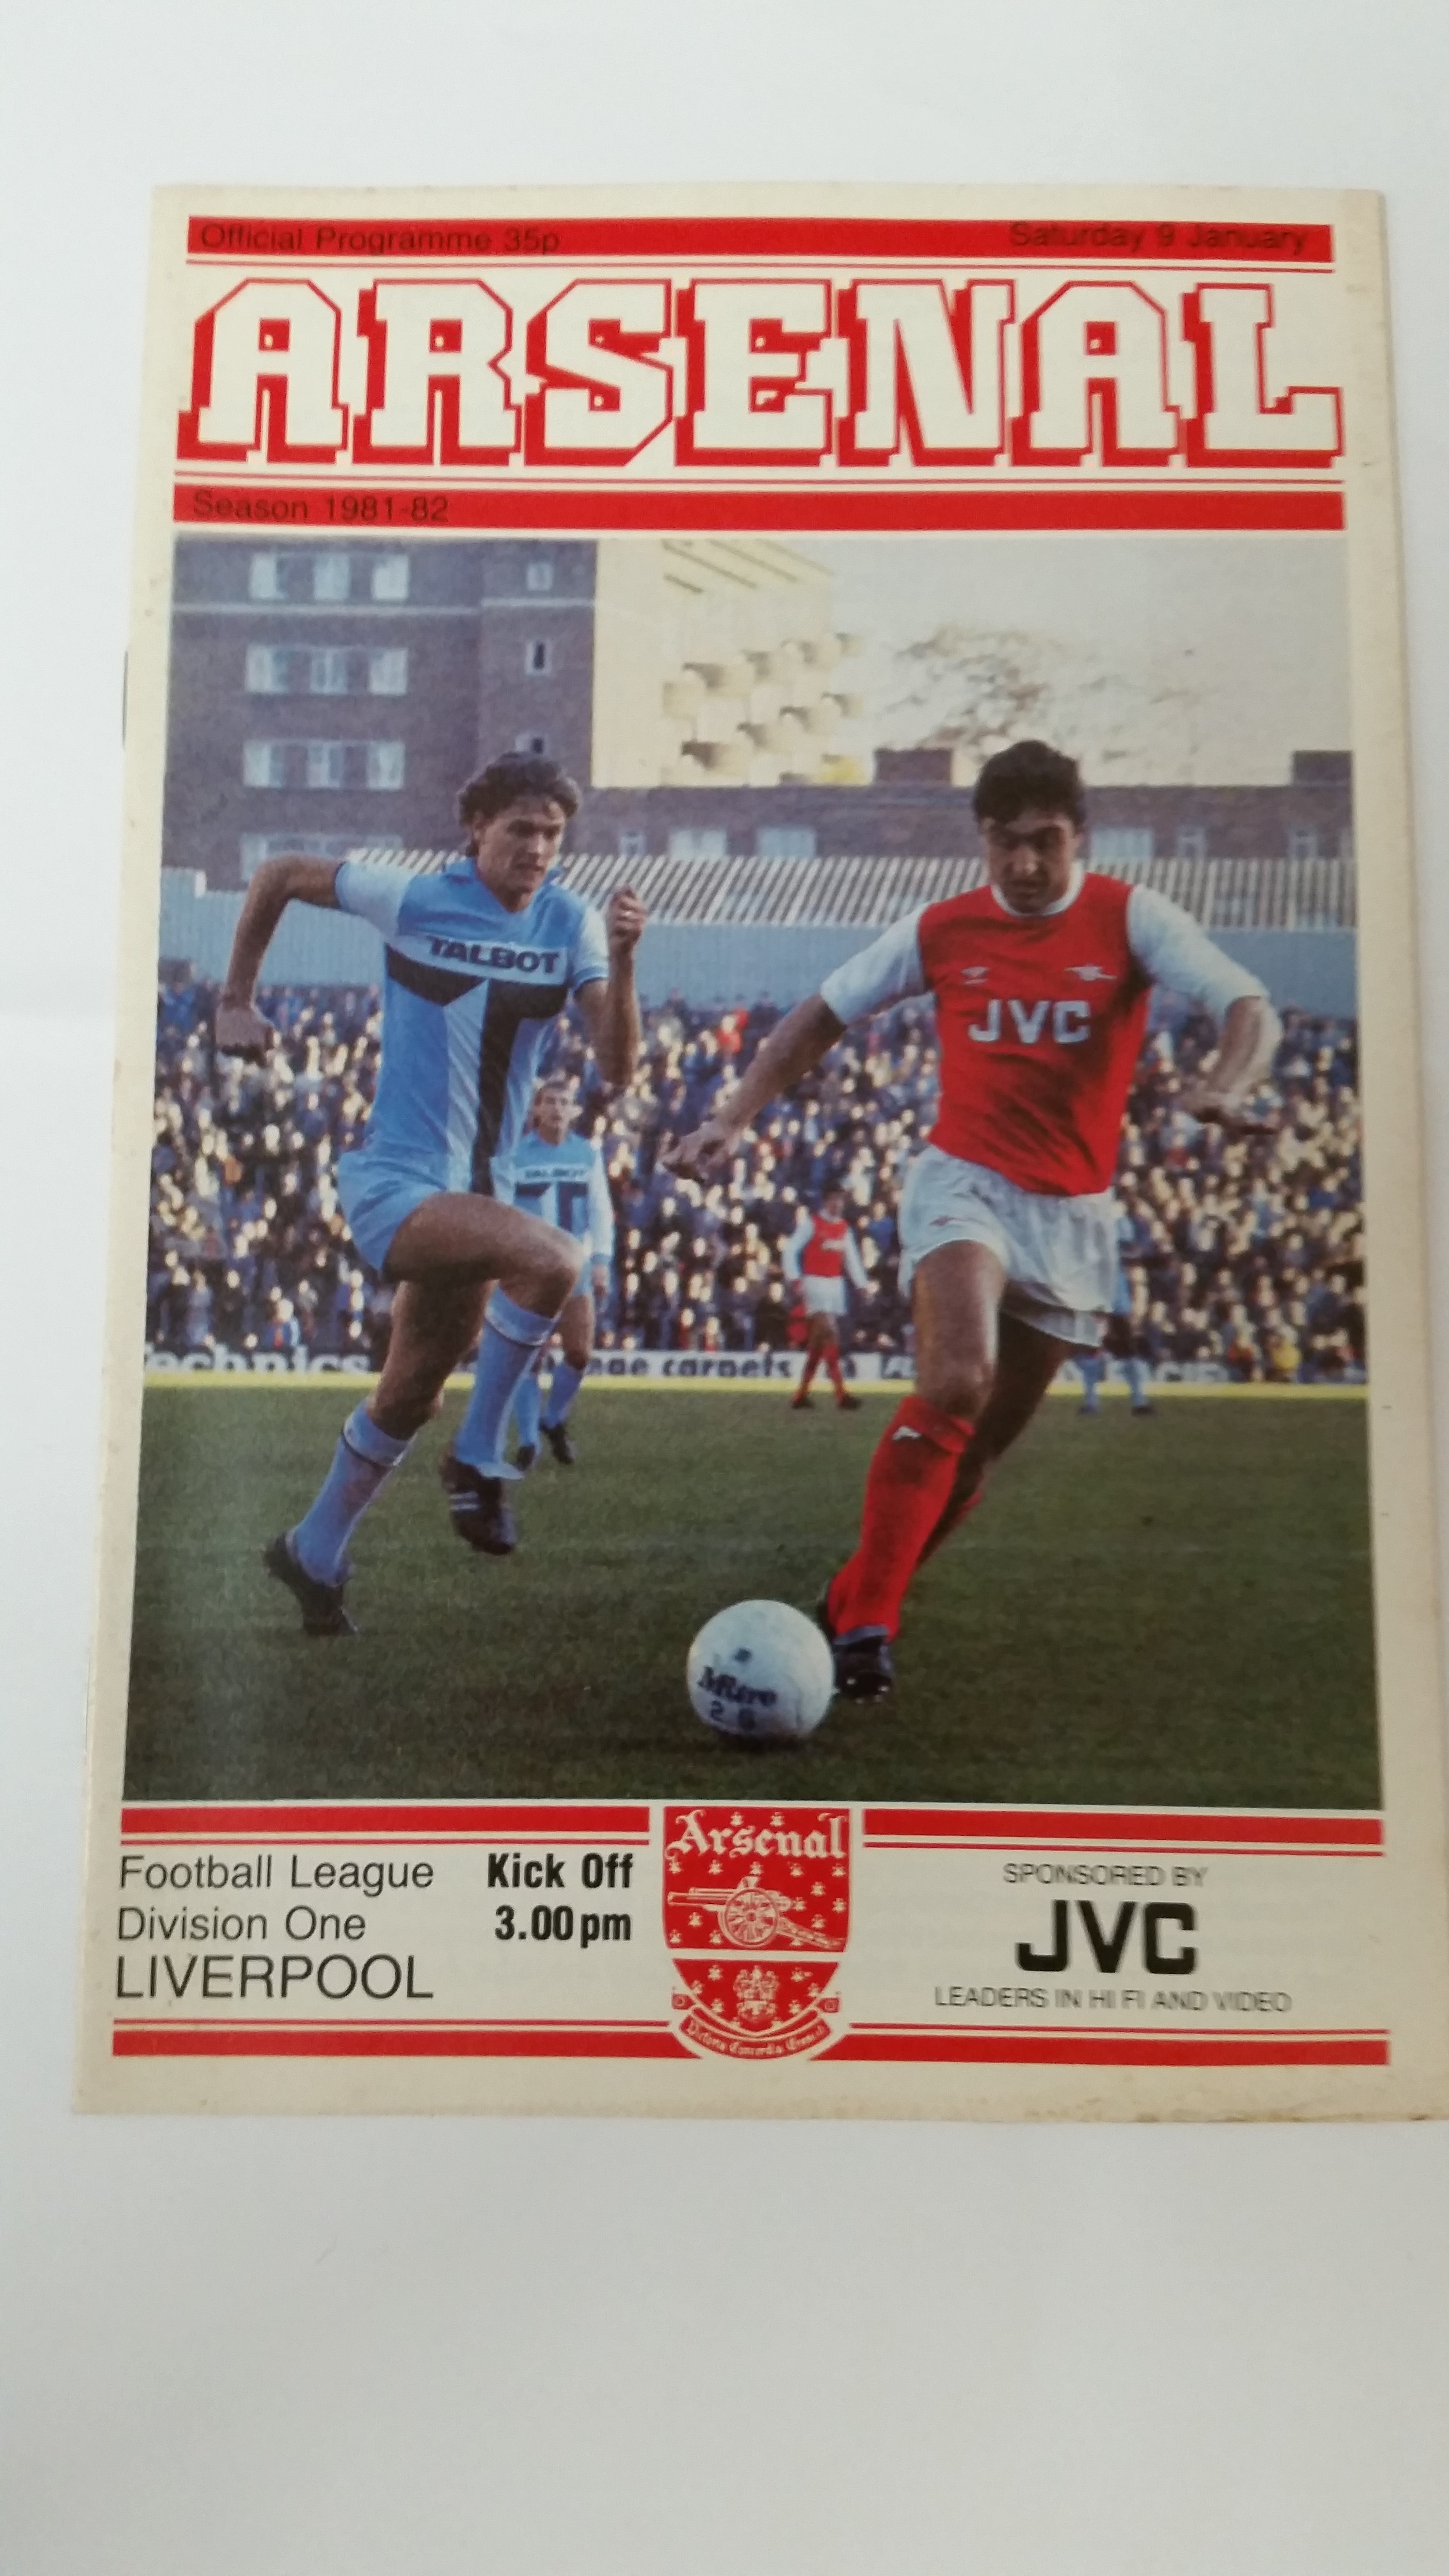 FOOTBALL, programme, Arsenal v Liverpool, 9th Jan 1982 postponed match, VG to EX